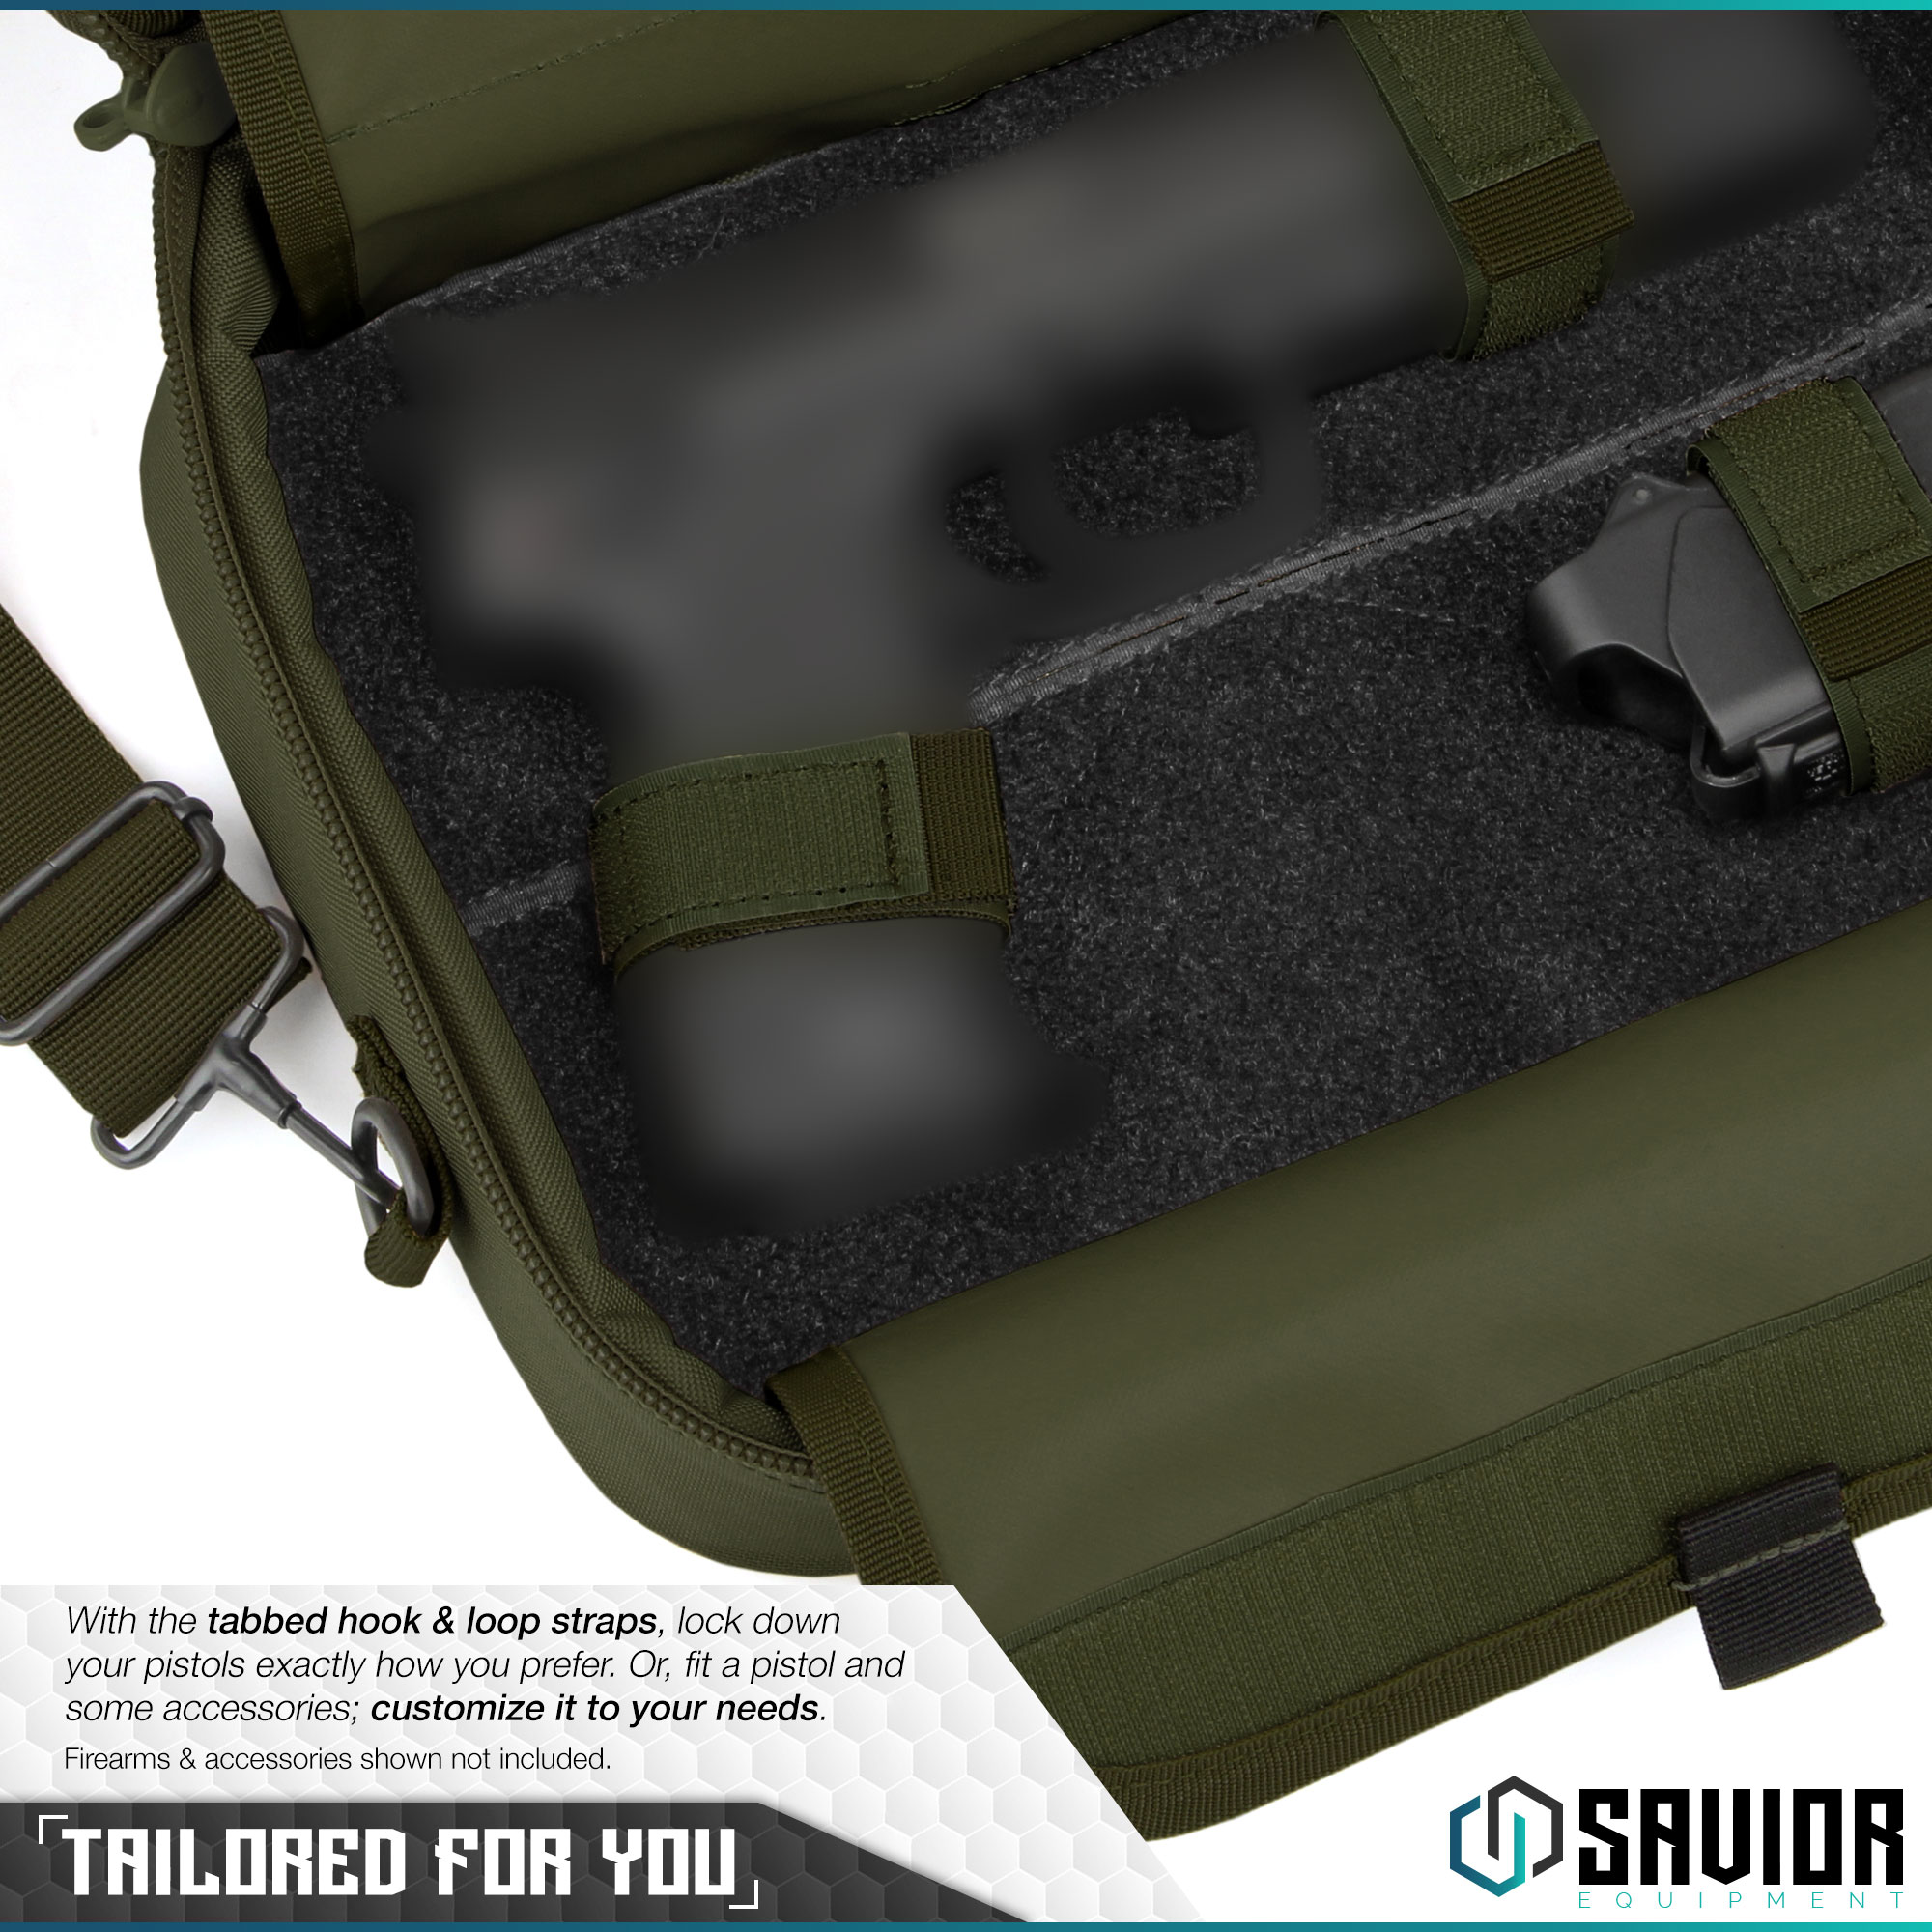 thumbnail 22 - 034-SAVIOR-034-Padded-Discreet-Double-Handgun-Bag-Pistol-Storage-Case-w-Mag-Pouch-Slot